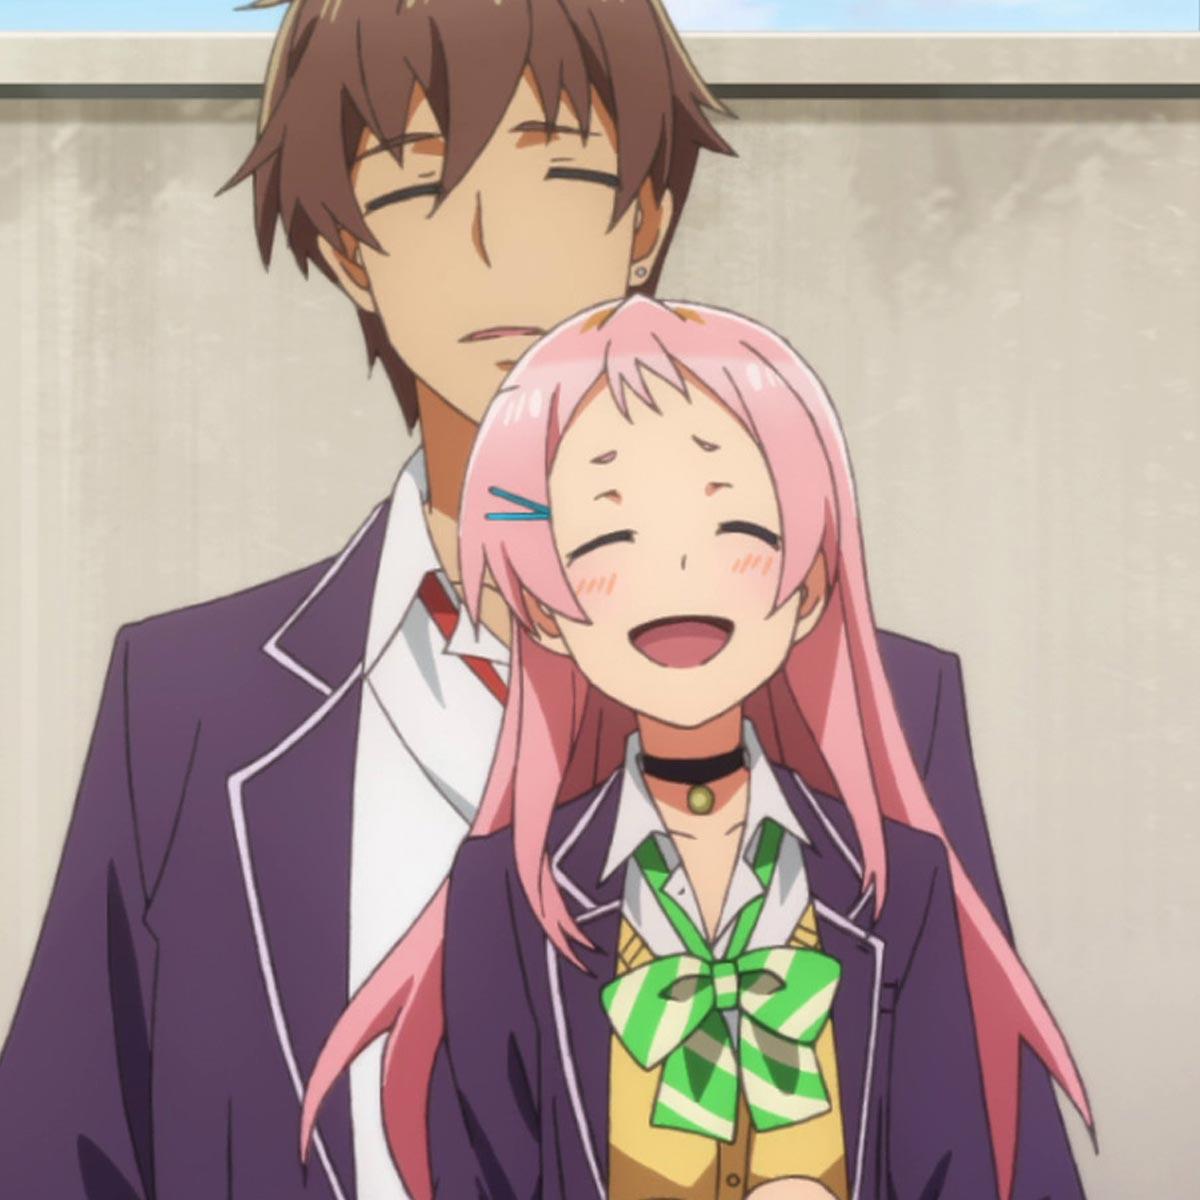 Gamers! y sus mejores personajes del anime [Top 3] - Tasuku